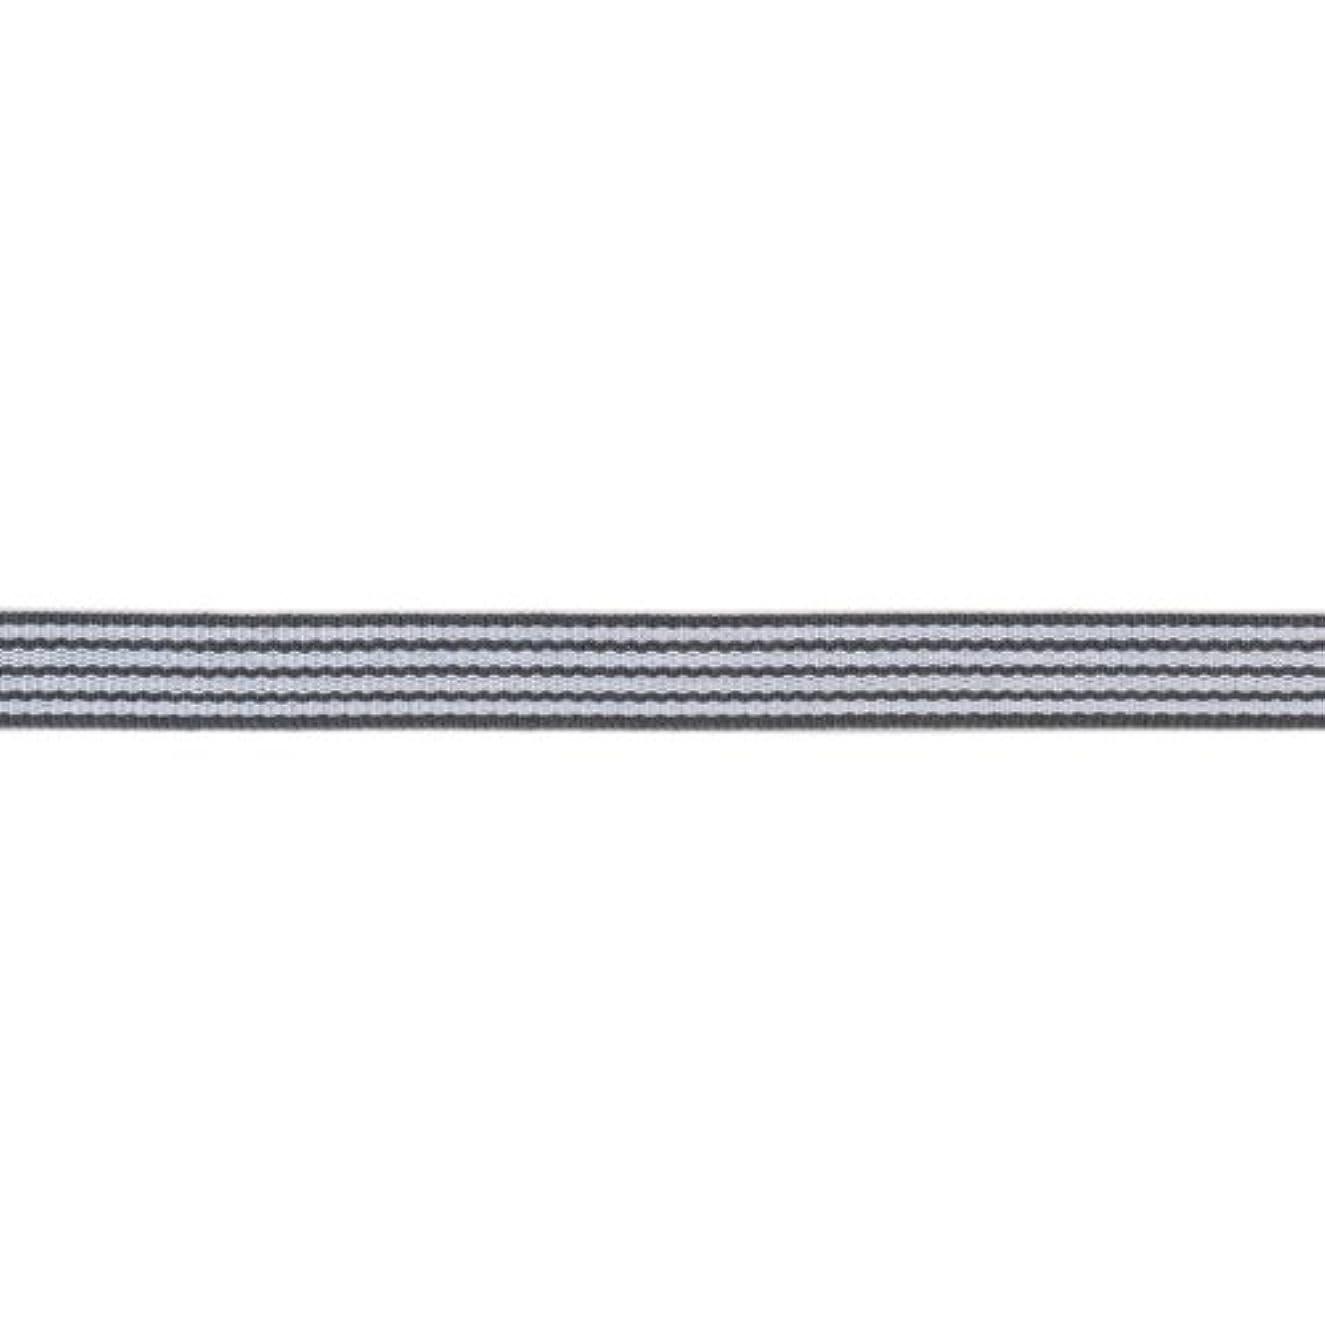 American Crafts 3/8-Inch Woven Horizontal Stripes Ribbon, 5-Yard Spool, Charcoal